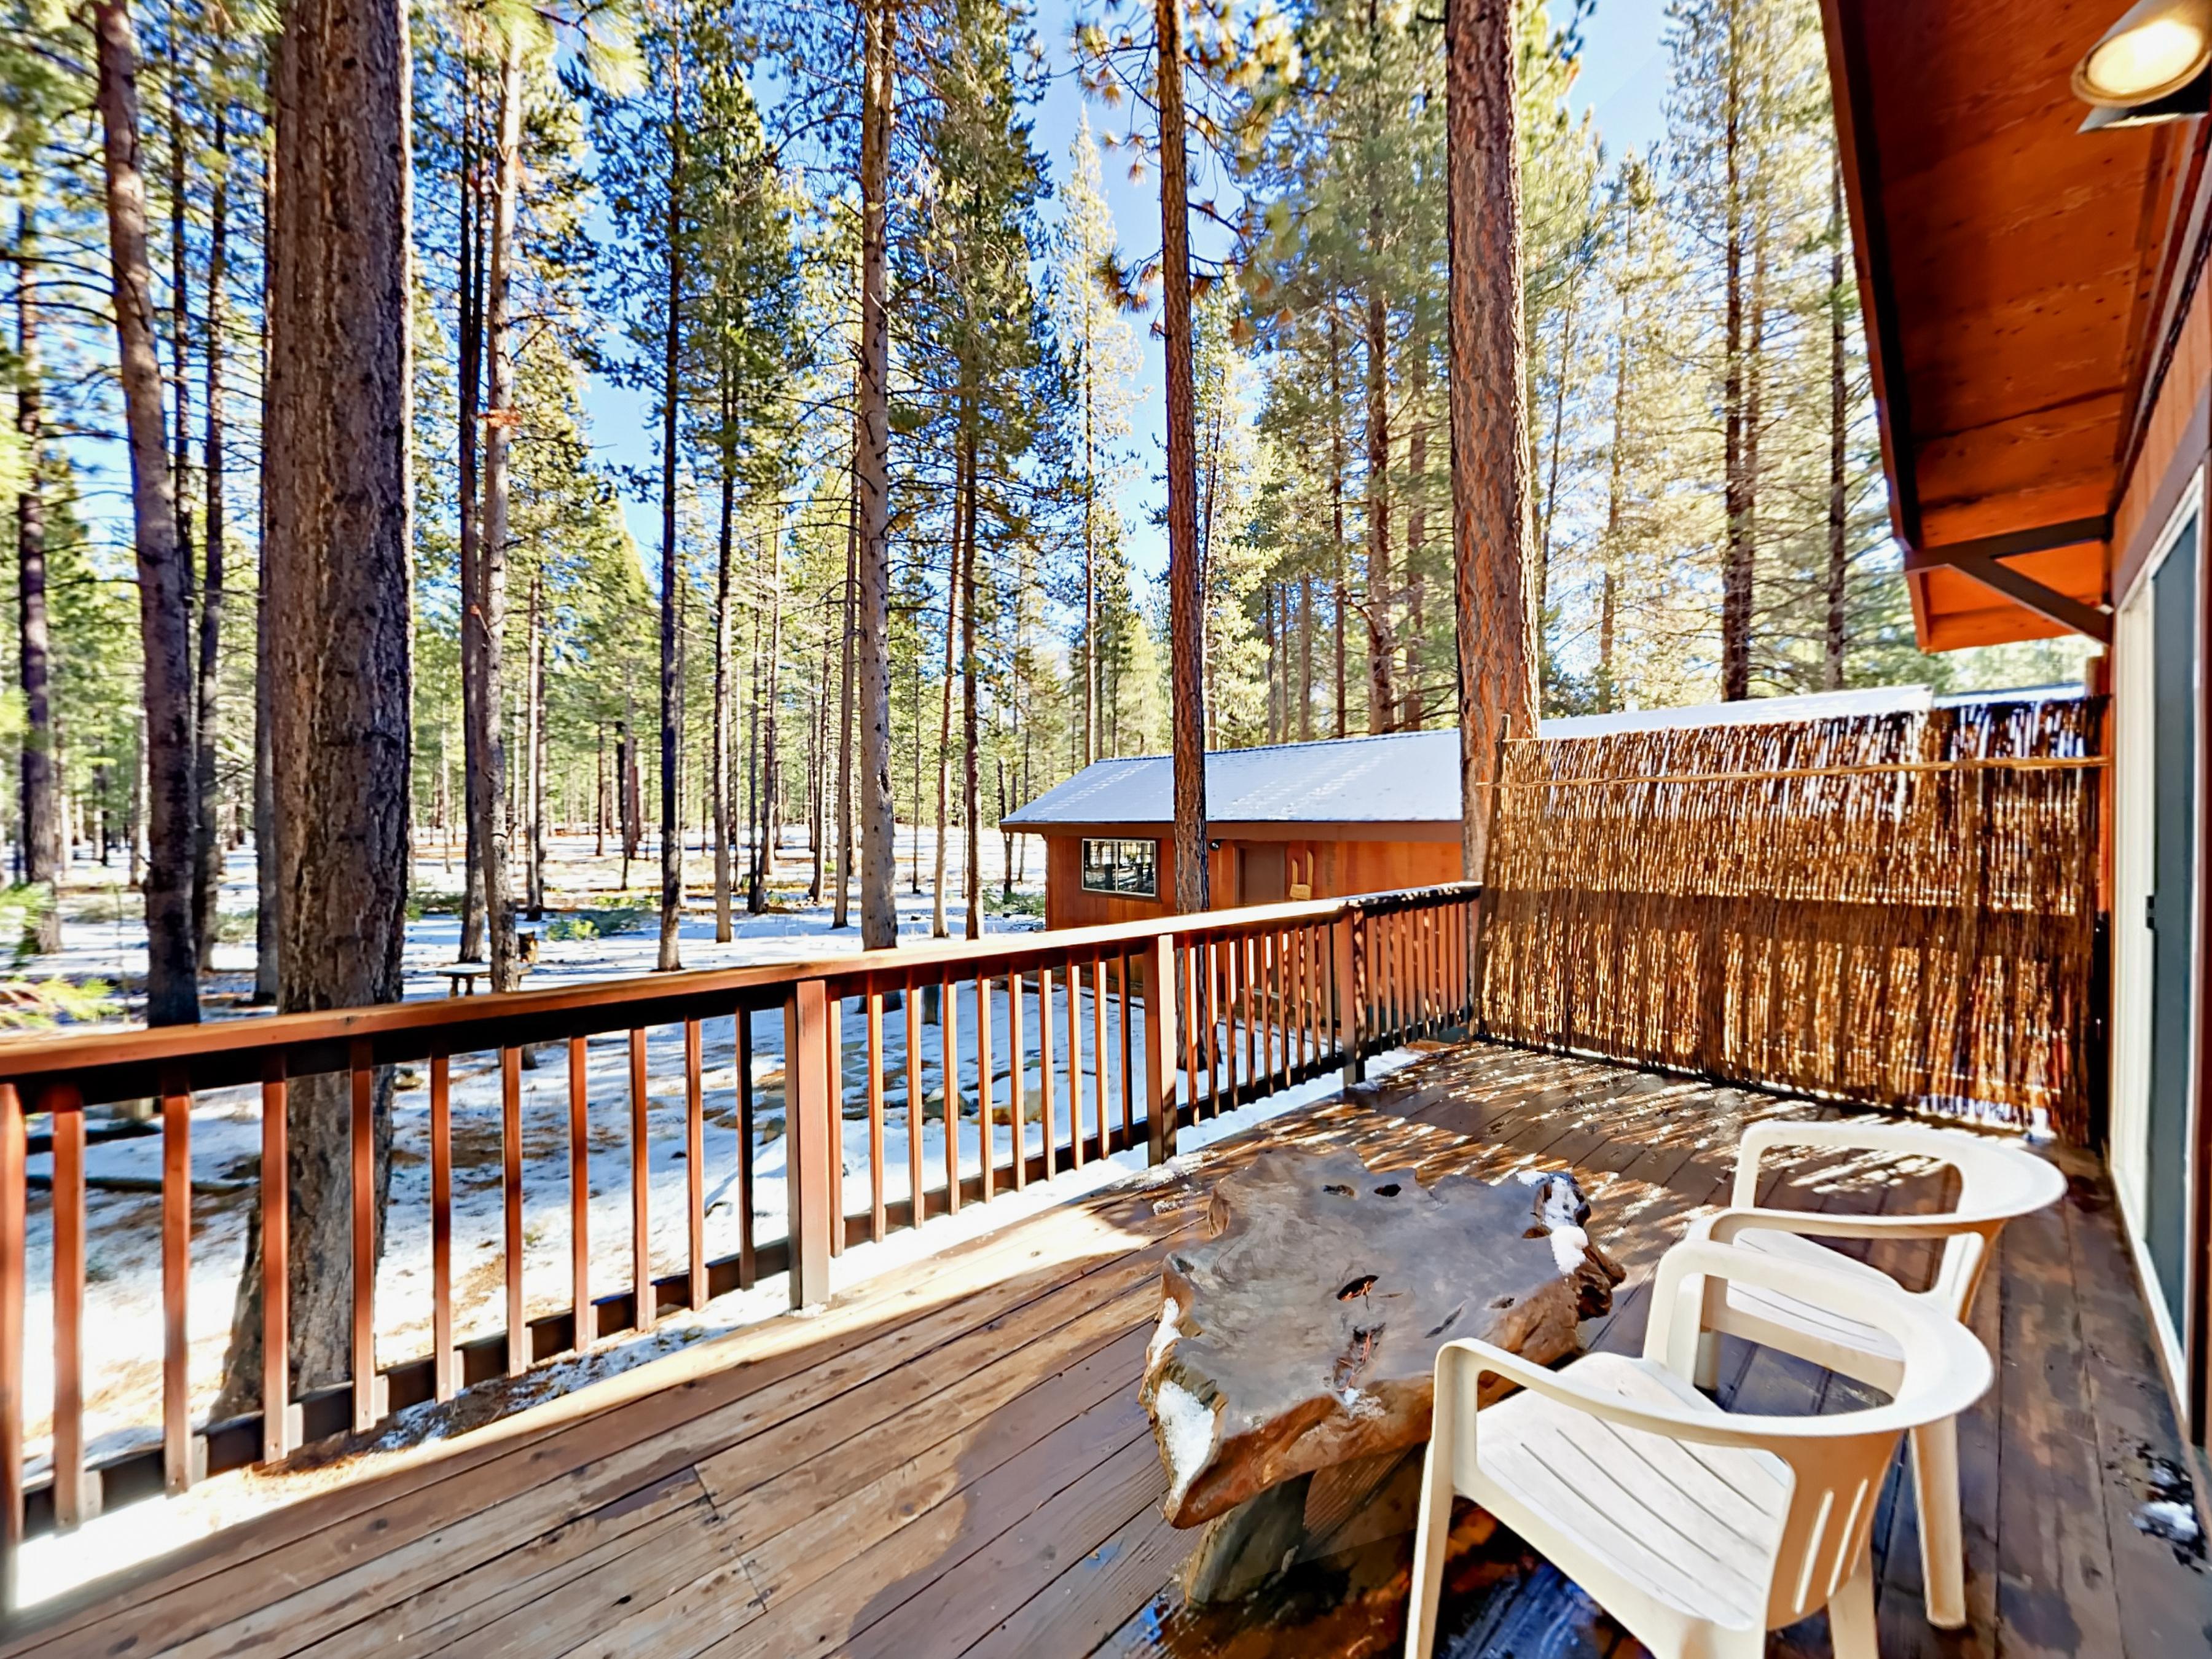 property beach rental original tahoe redawning kings in rentals cabins lake lodge north vacation